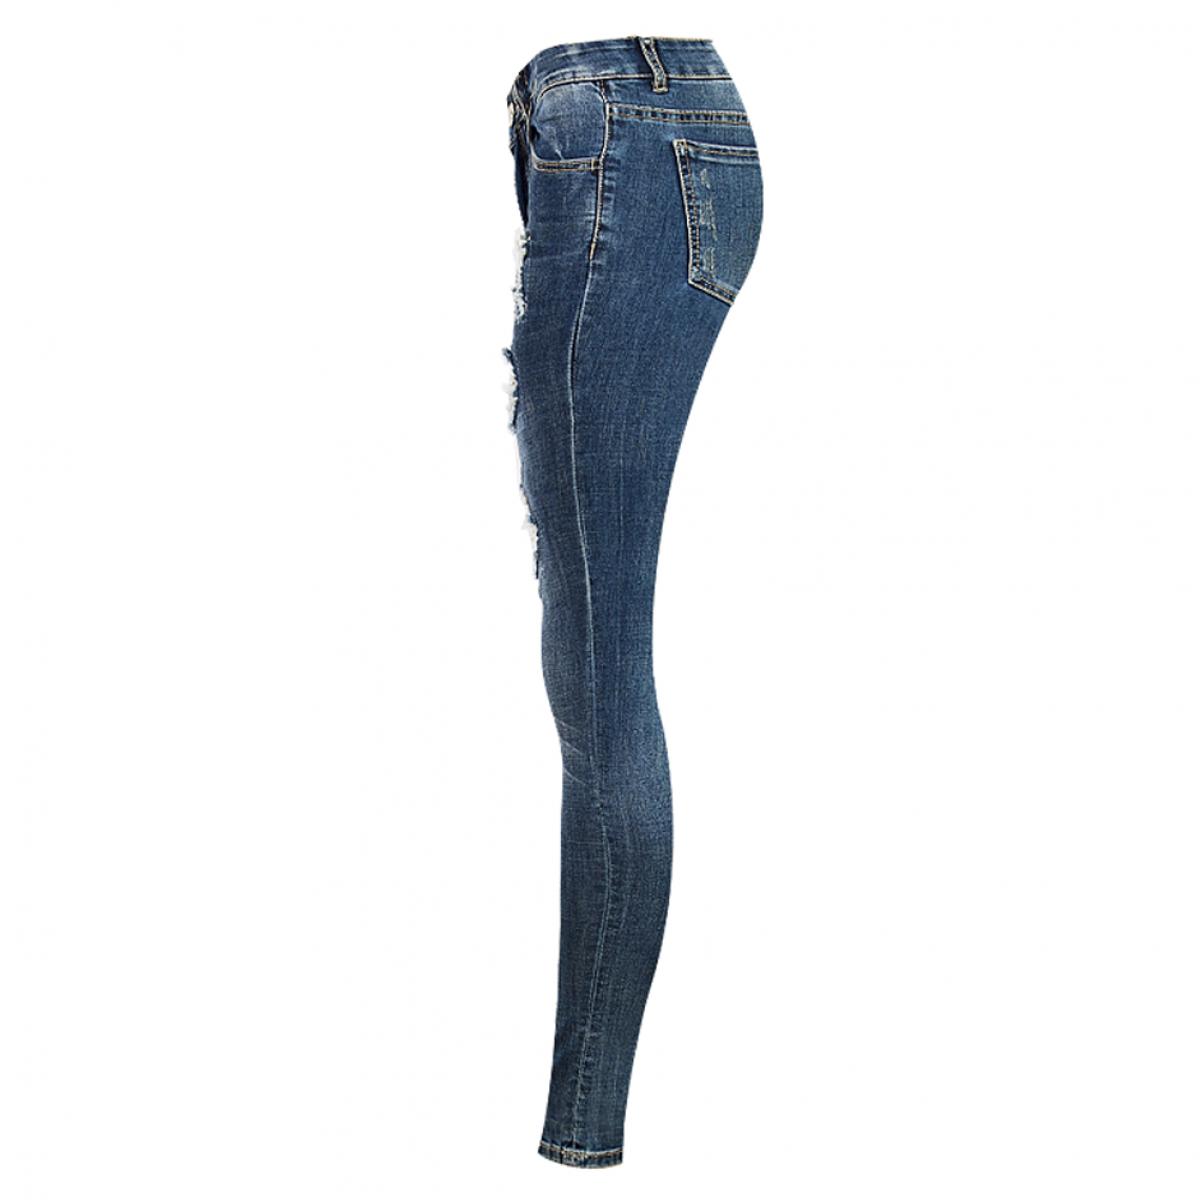 hereyfiletk.gq: denim jeggings. From The Community. Yelete Women's Basic Five Pocket Stretch Jegging Tights Pants, XXXL, Denim Blue. CLOYA Women's Denim Print Fake Jeans Seamless Full Length Fleece Lined Leggings. by CLOYA. $ - $ $ .